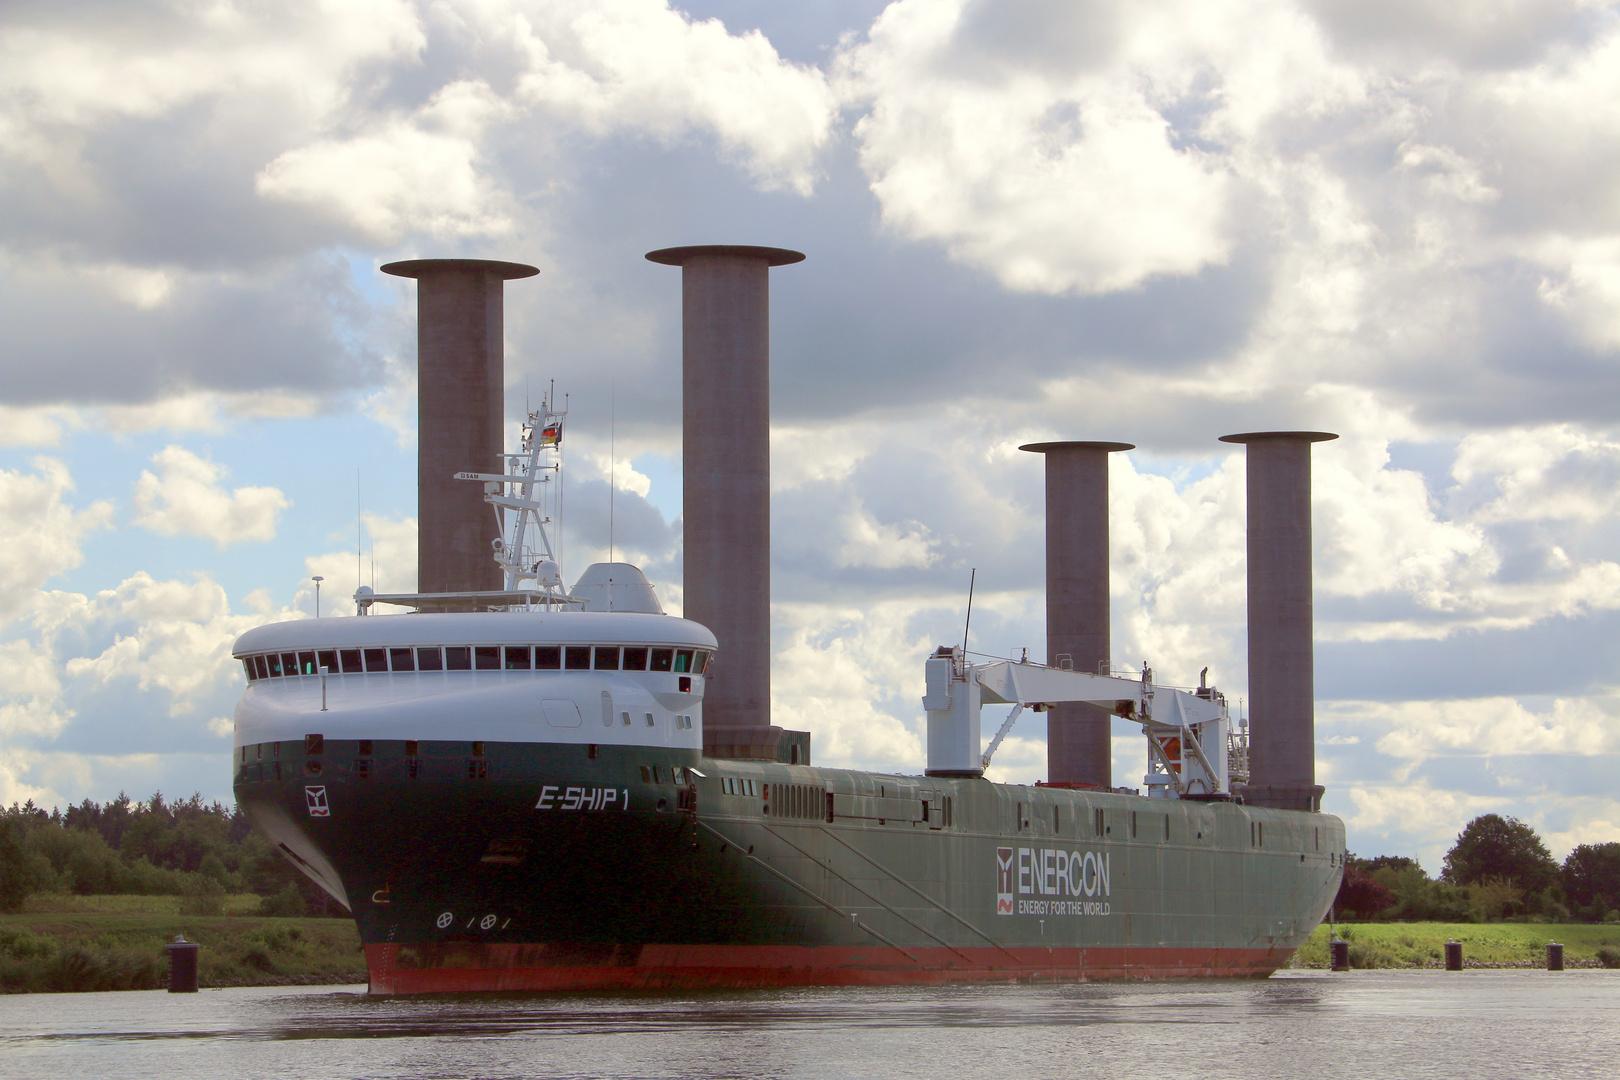 E Ship 1 Foto Bild Schiff Nok Verkehr Bilder Auf Fotocommunity